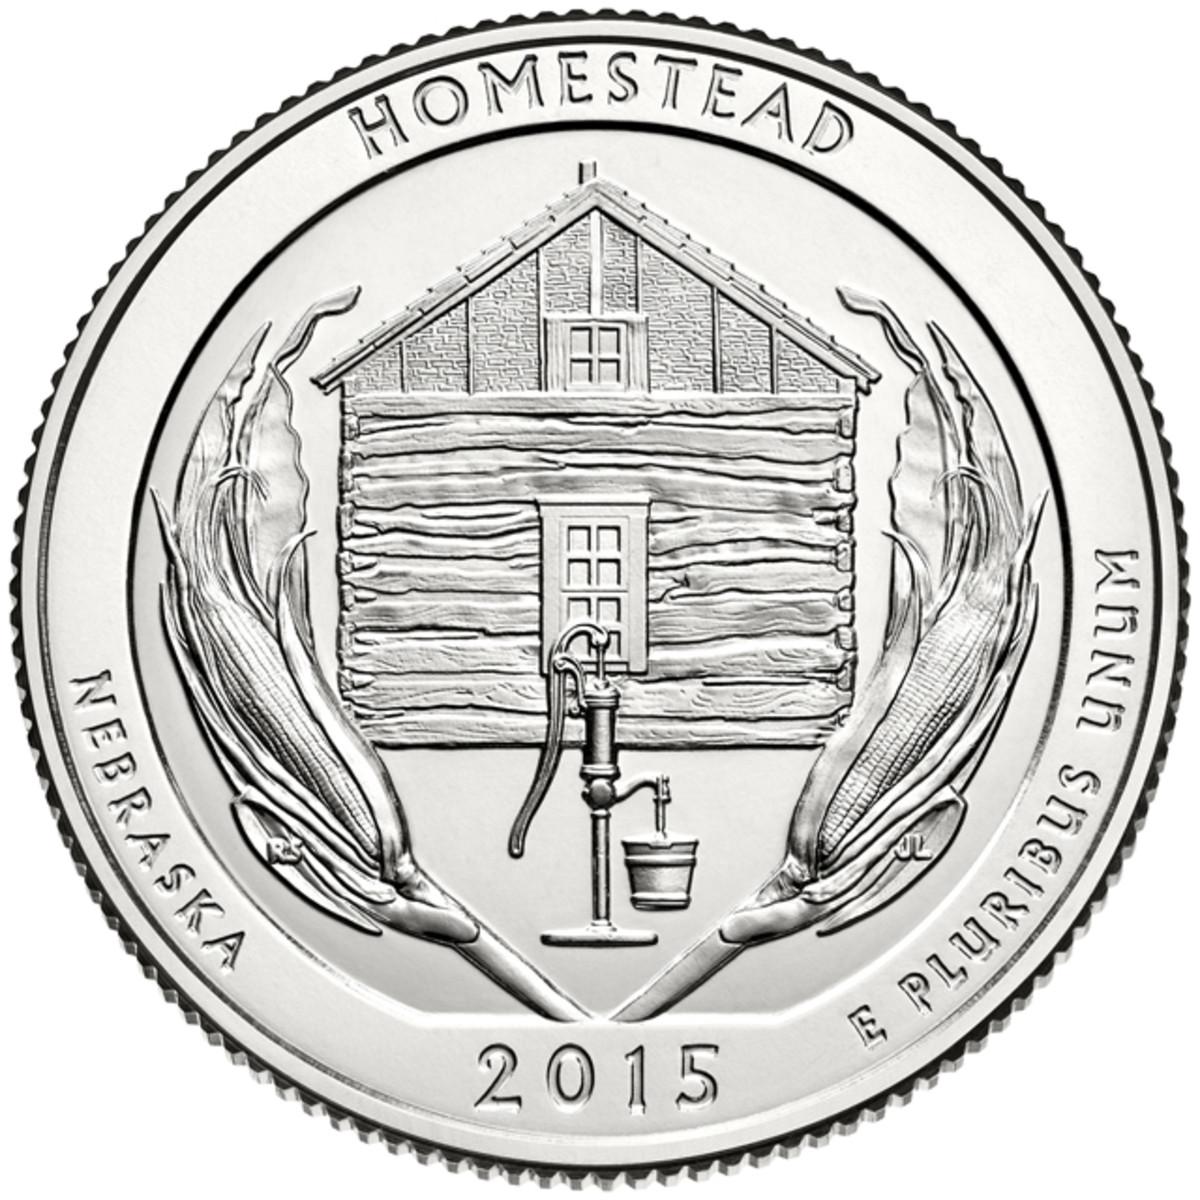 The 2015 Homestead National Monument quarter.